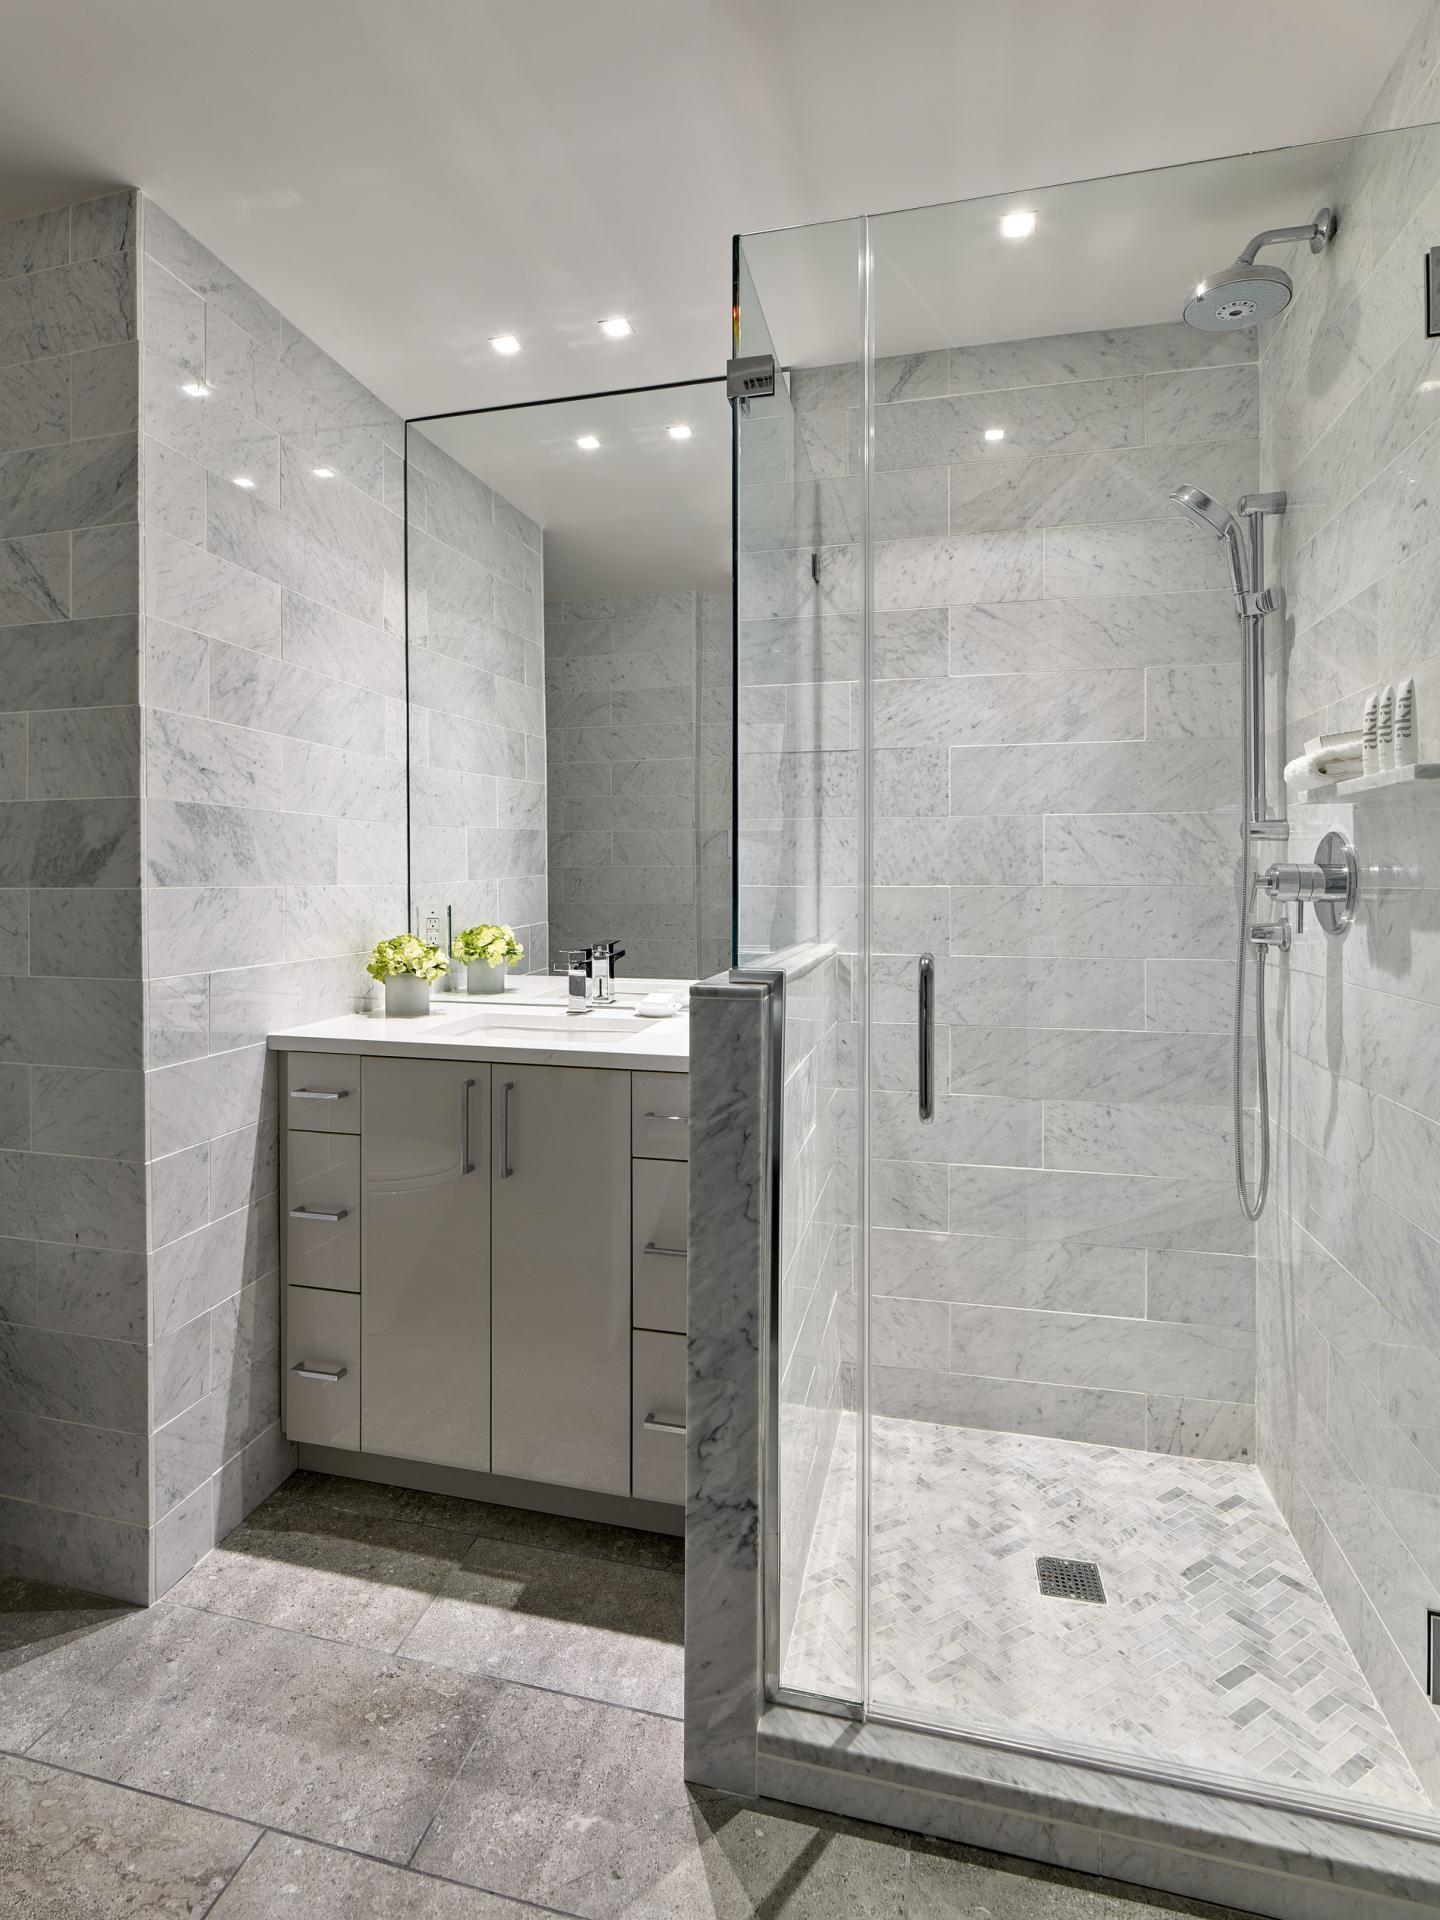 Bathroom at AKA Rittenhouse Square